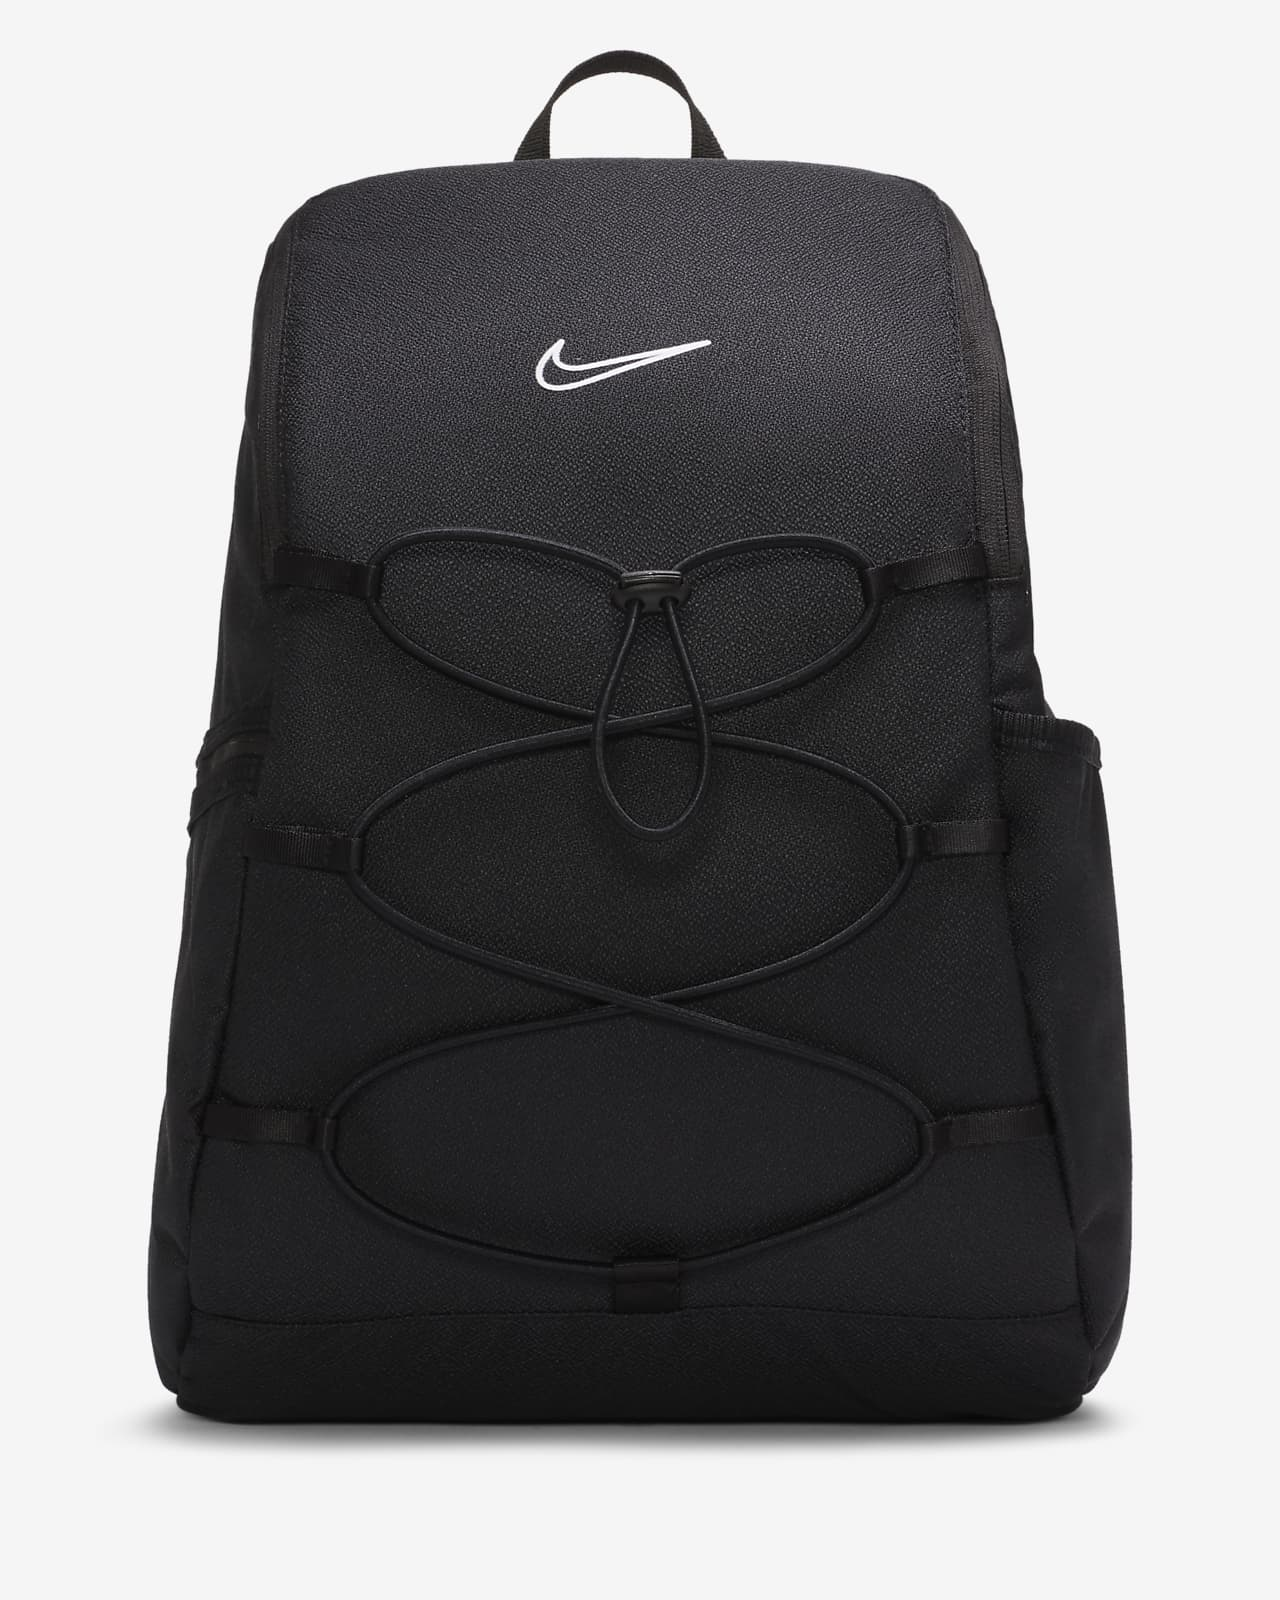 Женский рюкзак для тренинга Nike One